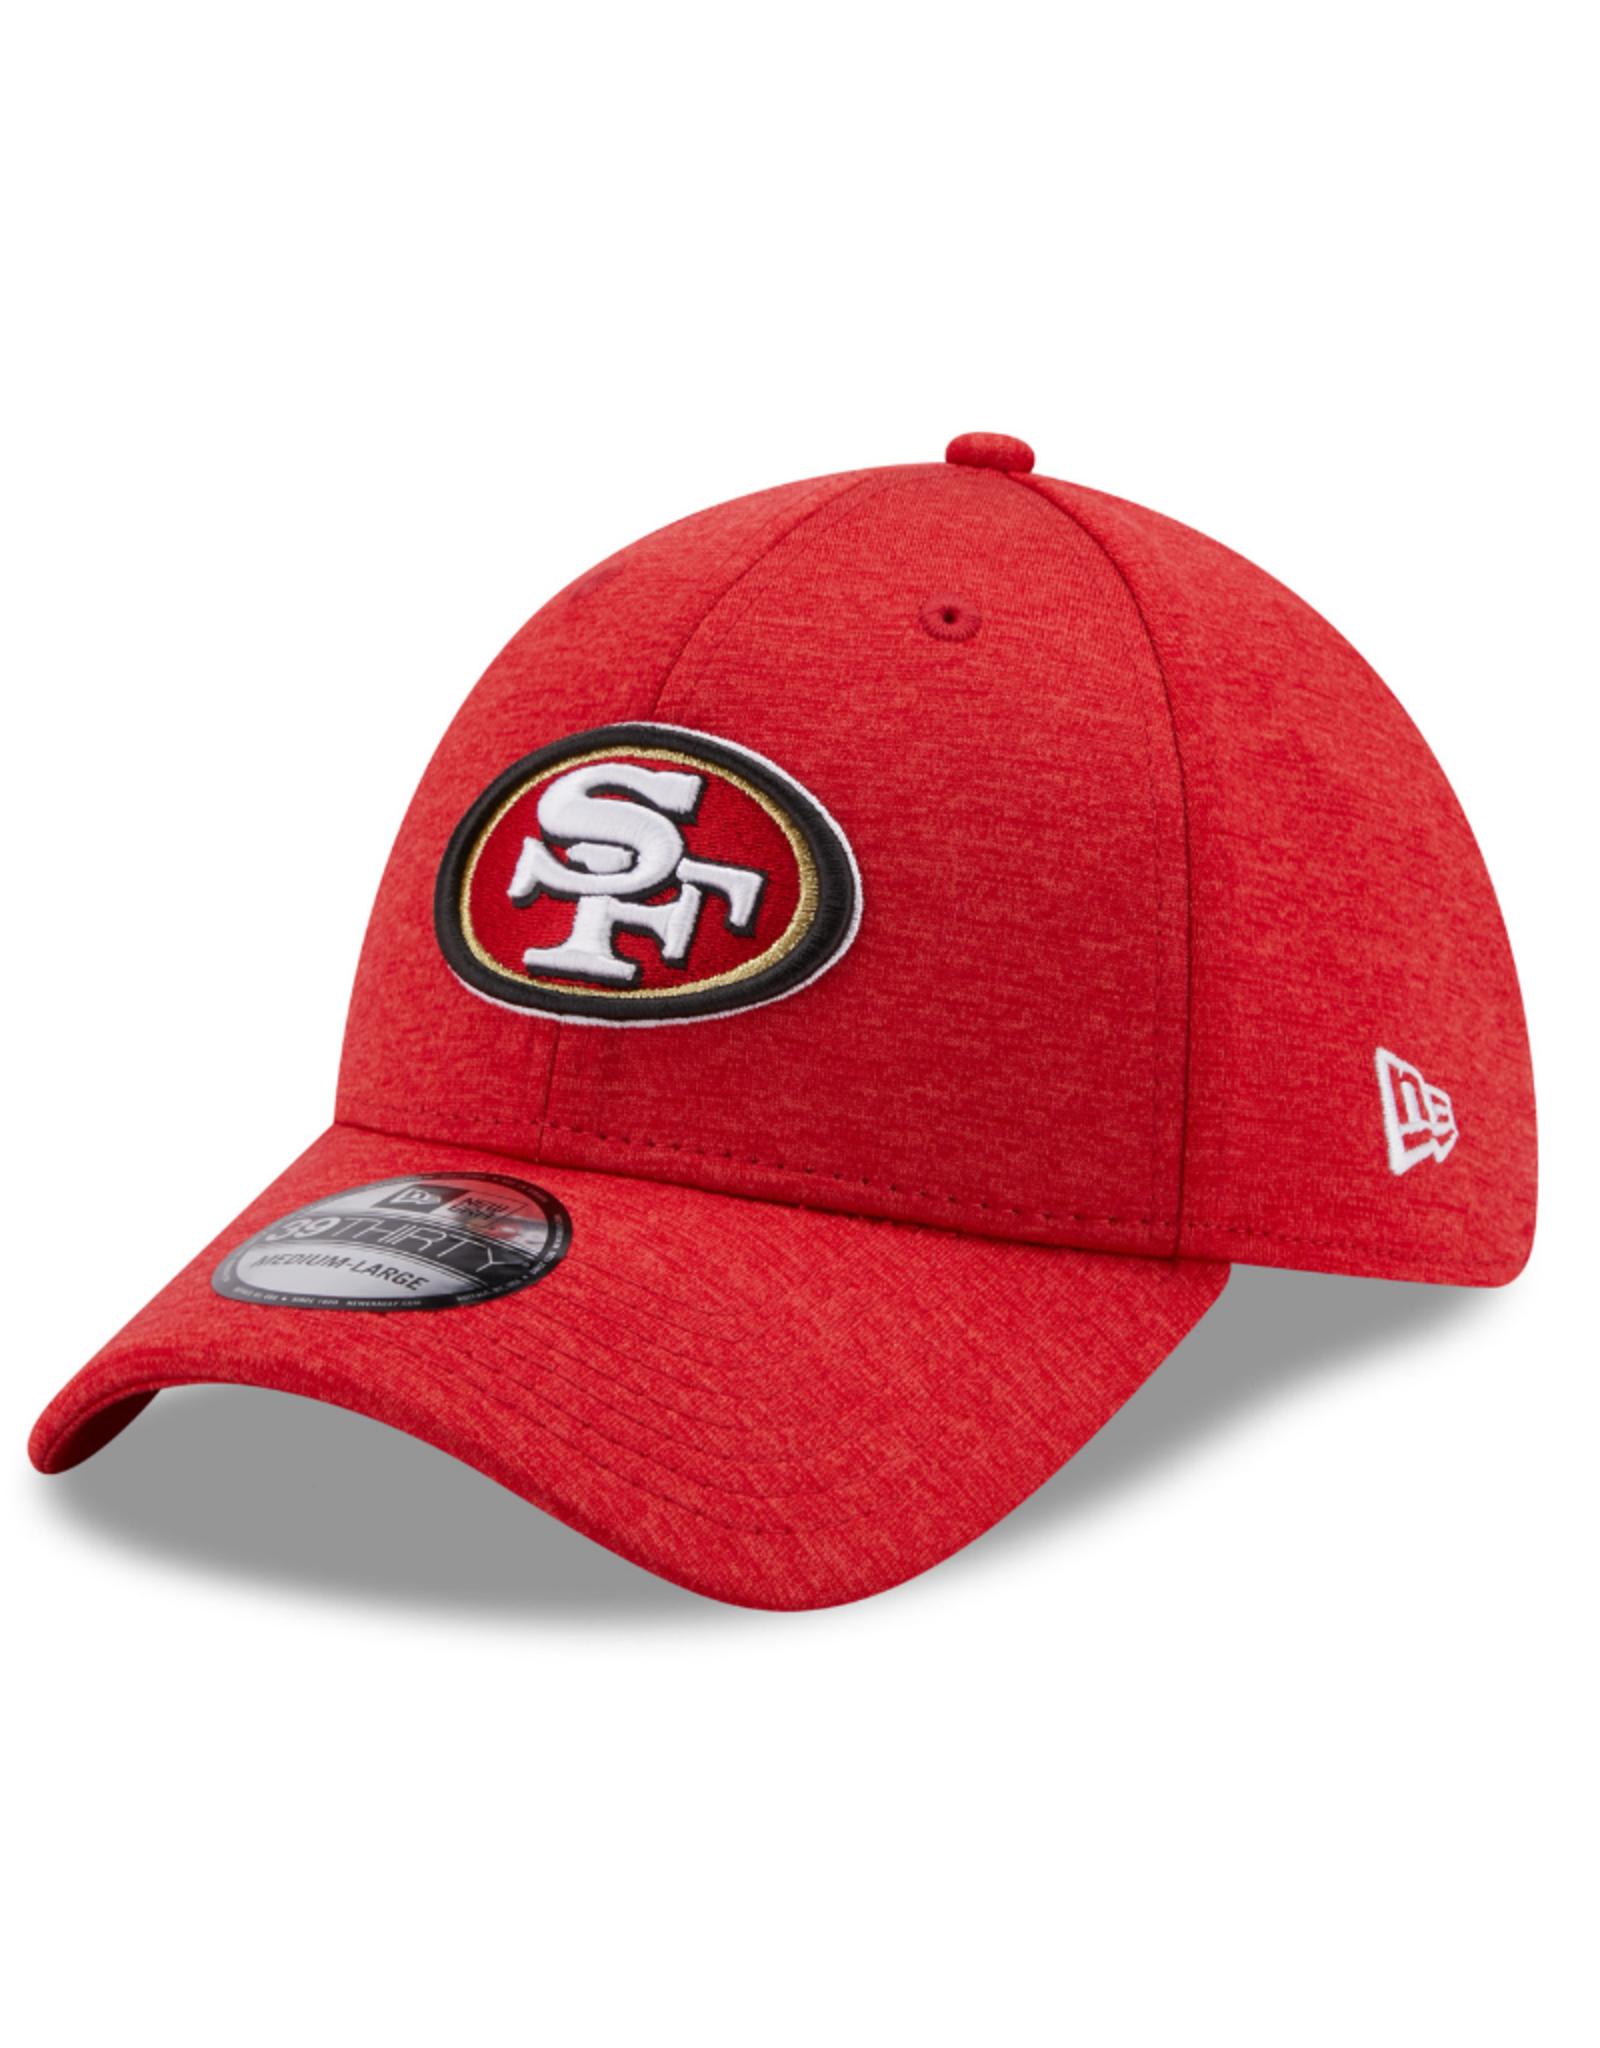 New Era Adult 39THIRTY Shadow B3 Hat San Fransisco 49er's Burgandy